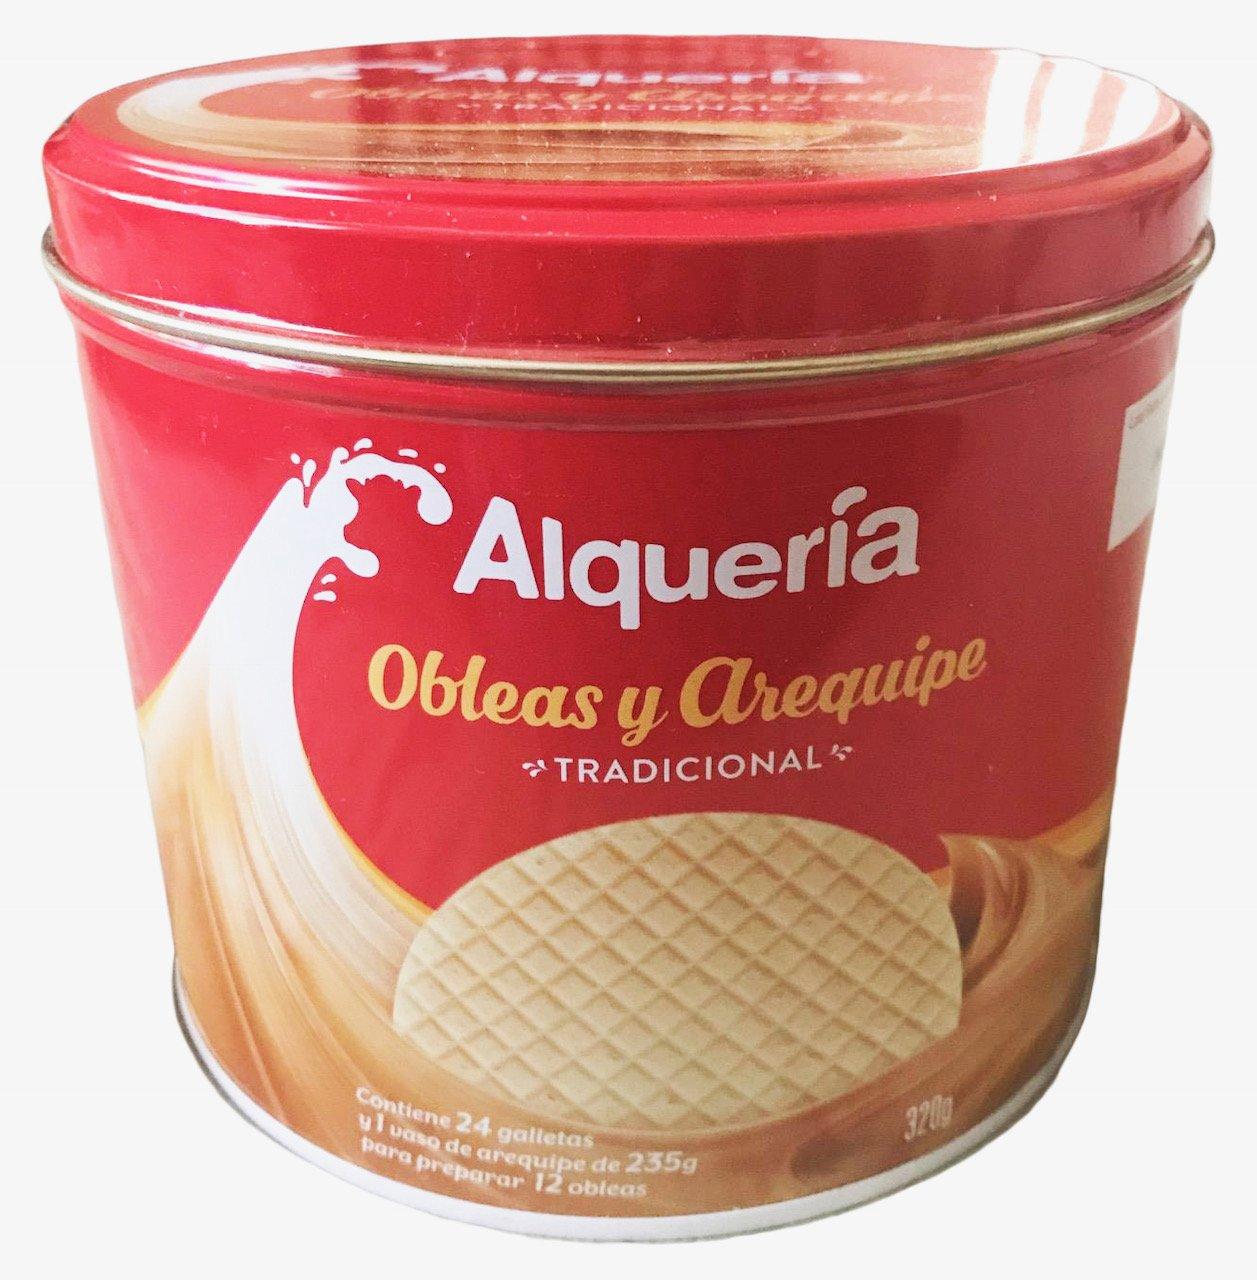 Amazon.com : Obleas y Arequipe Alqueria (Tradicional) 320 Grams : Grocery & Gourmet Food